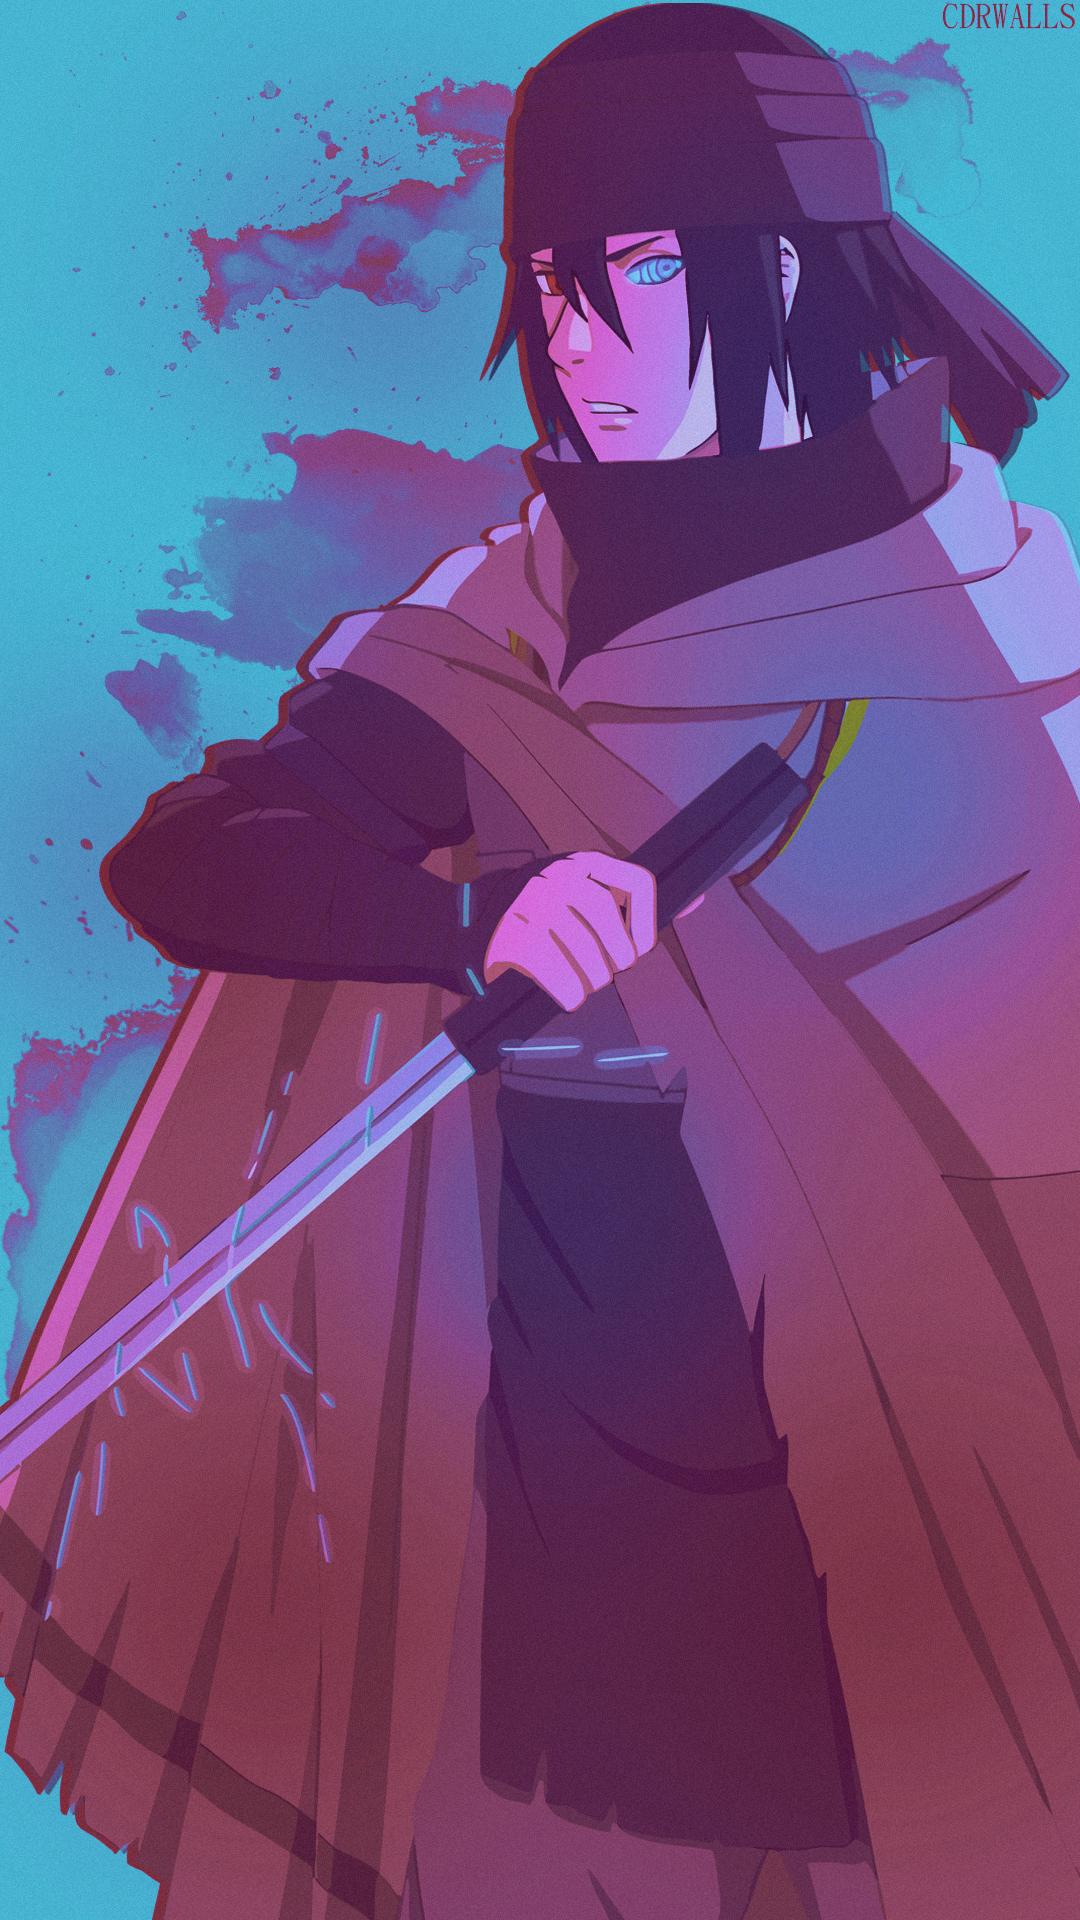 Sasuke Naruto The Last Phone Wallpaper By Cdrwalls On Deviantart